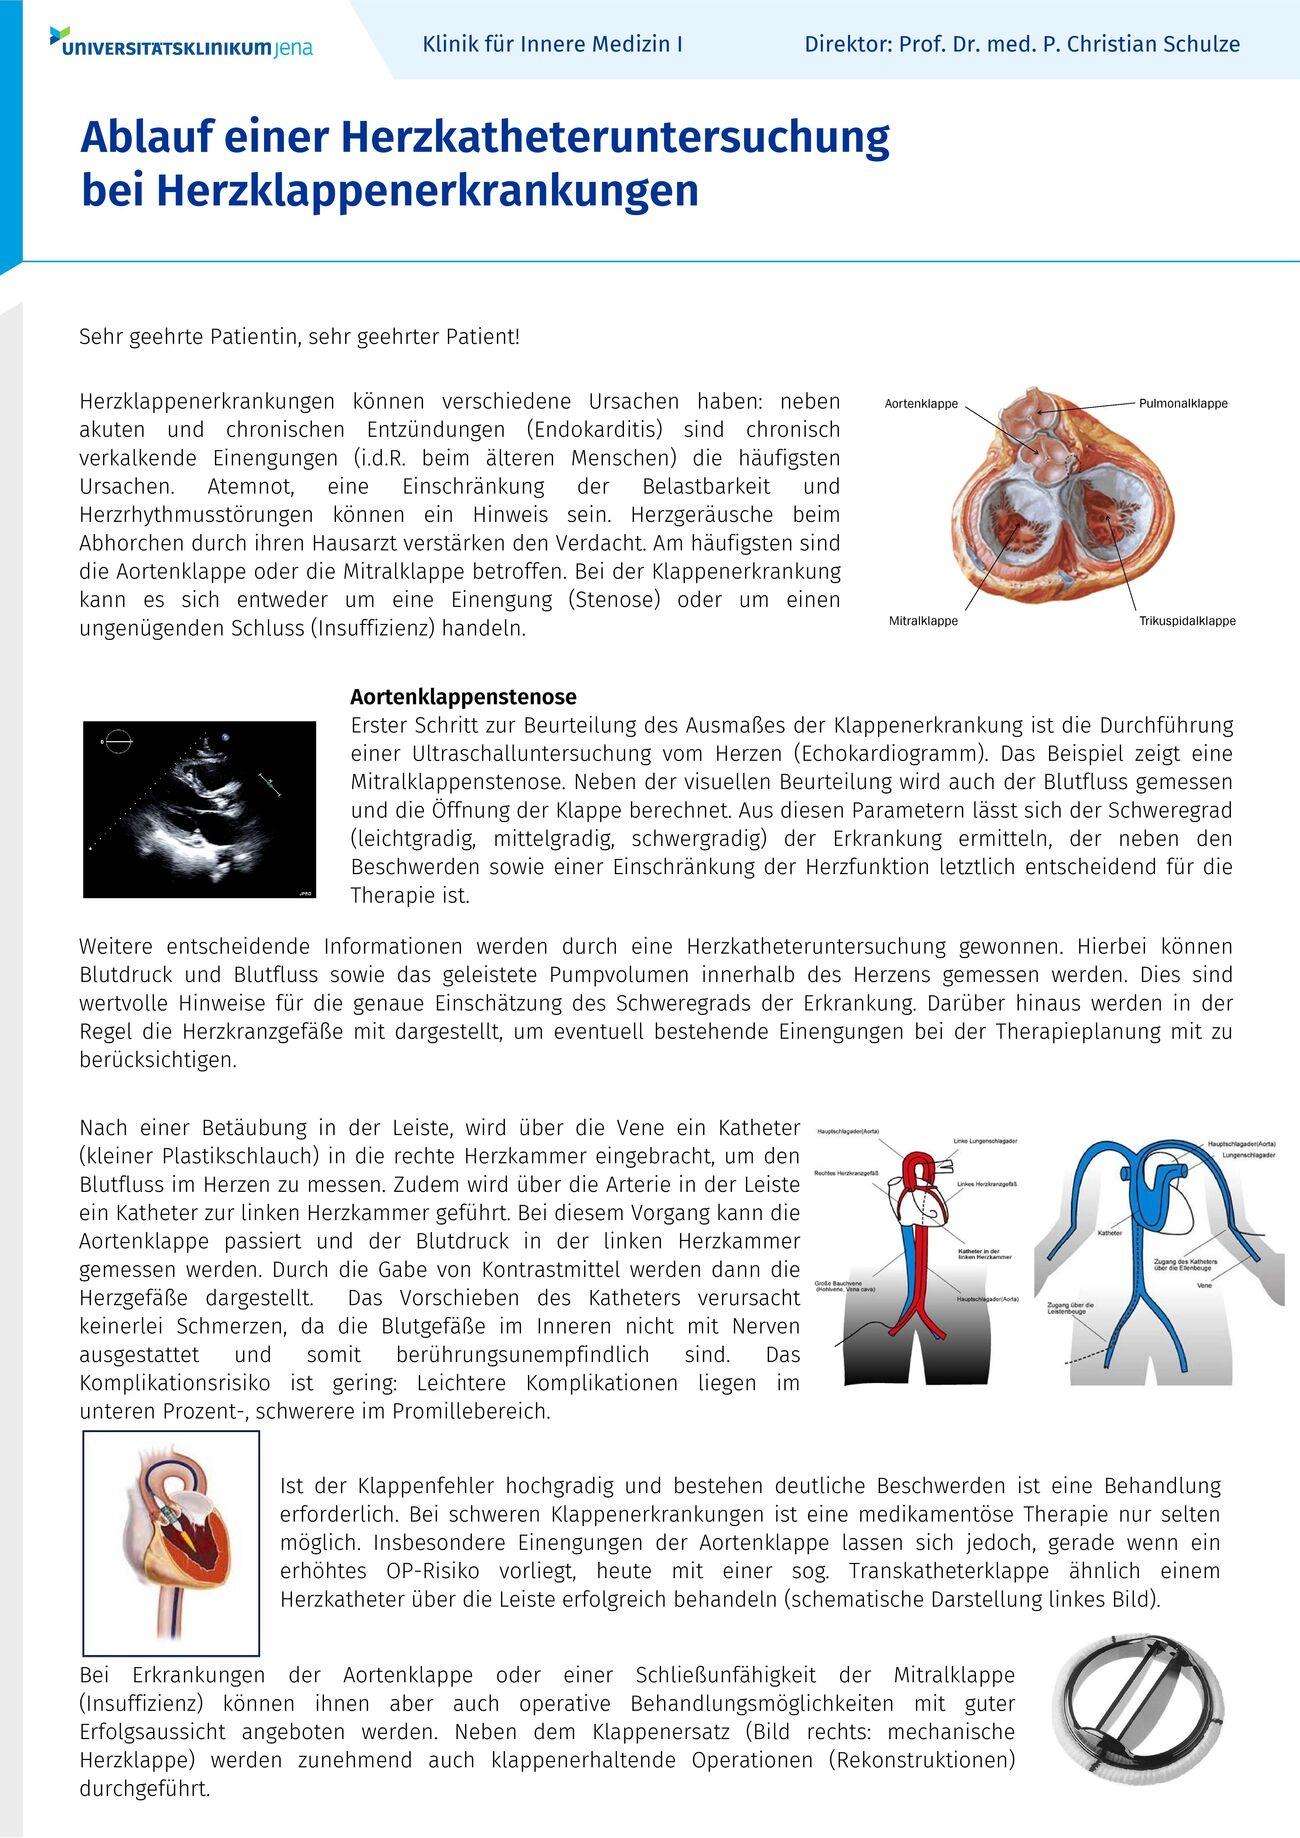 Großartig Der Blutfluss Zu Den Nieren Bilder - Anatomie Ideen ...